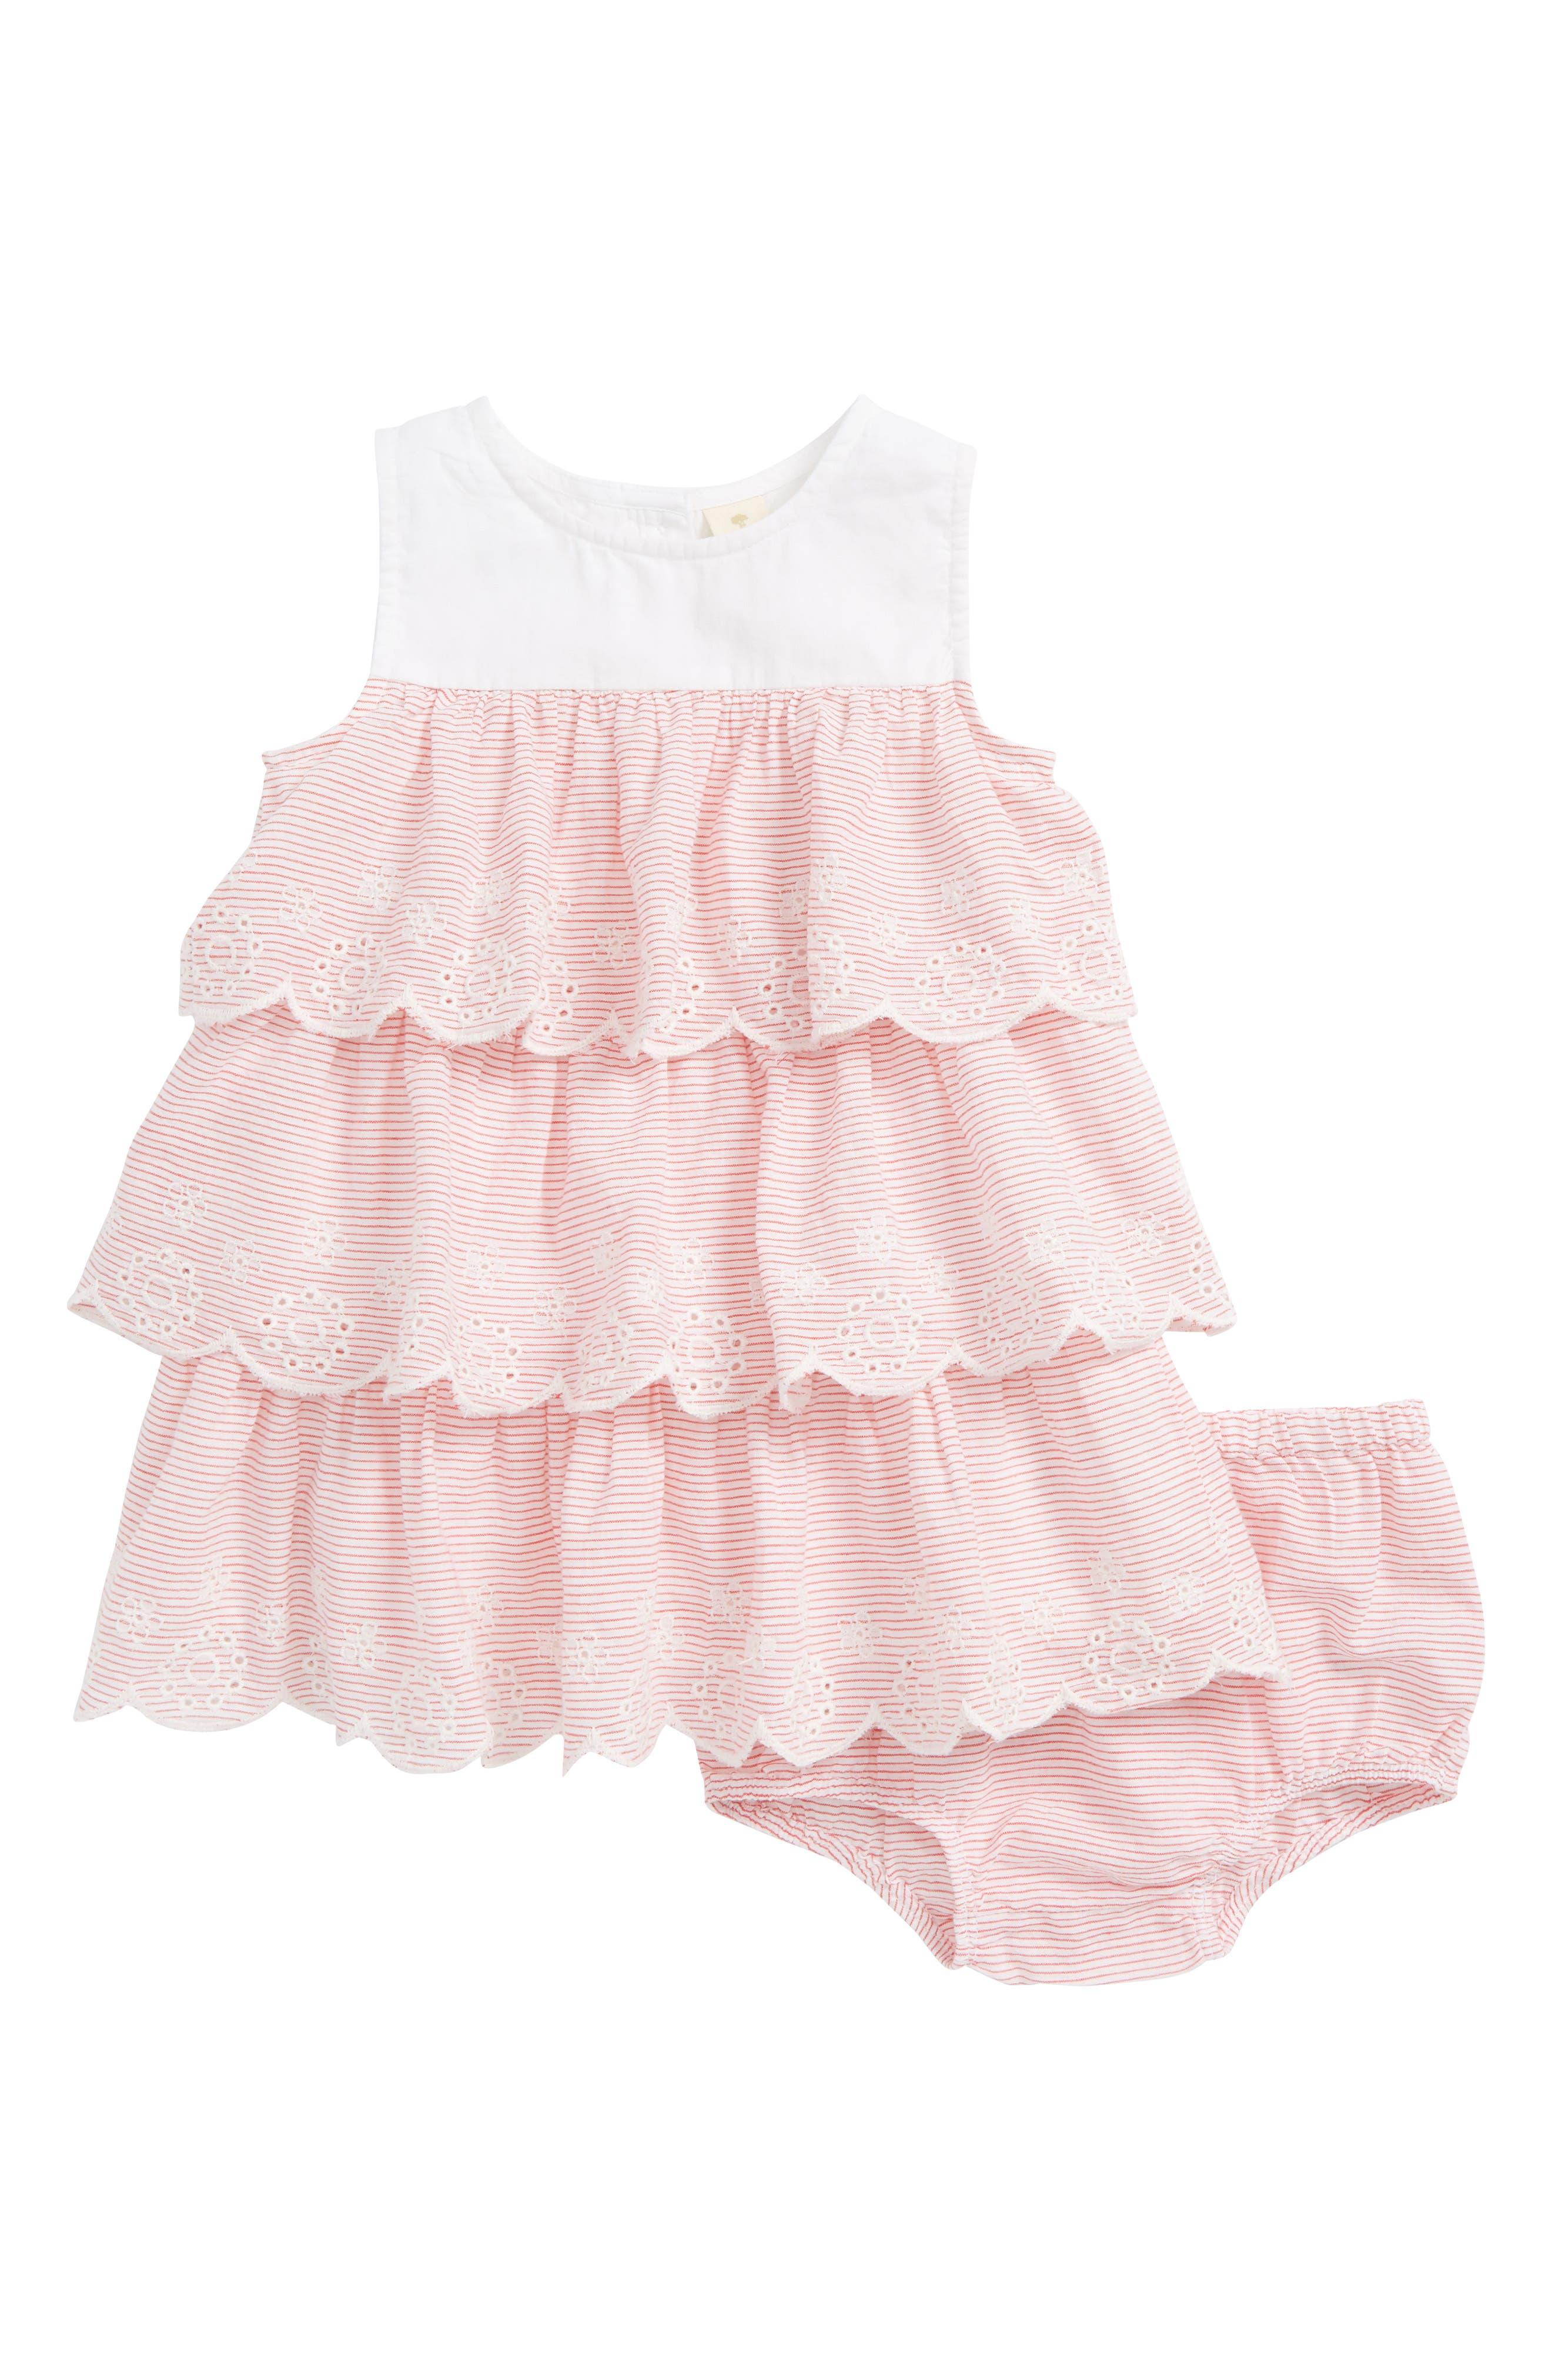 Tucker Tate Tiered Woven Dress Baby Girls Free Shipping